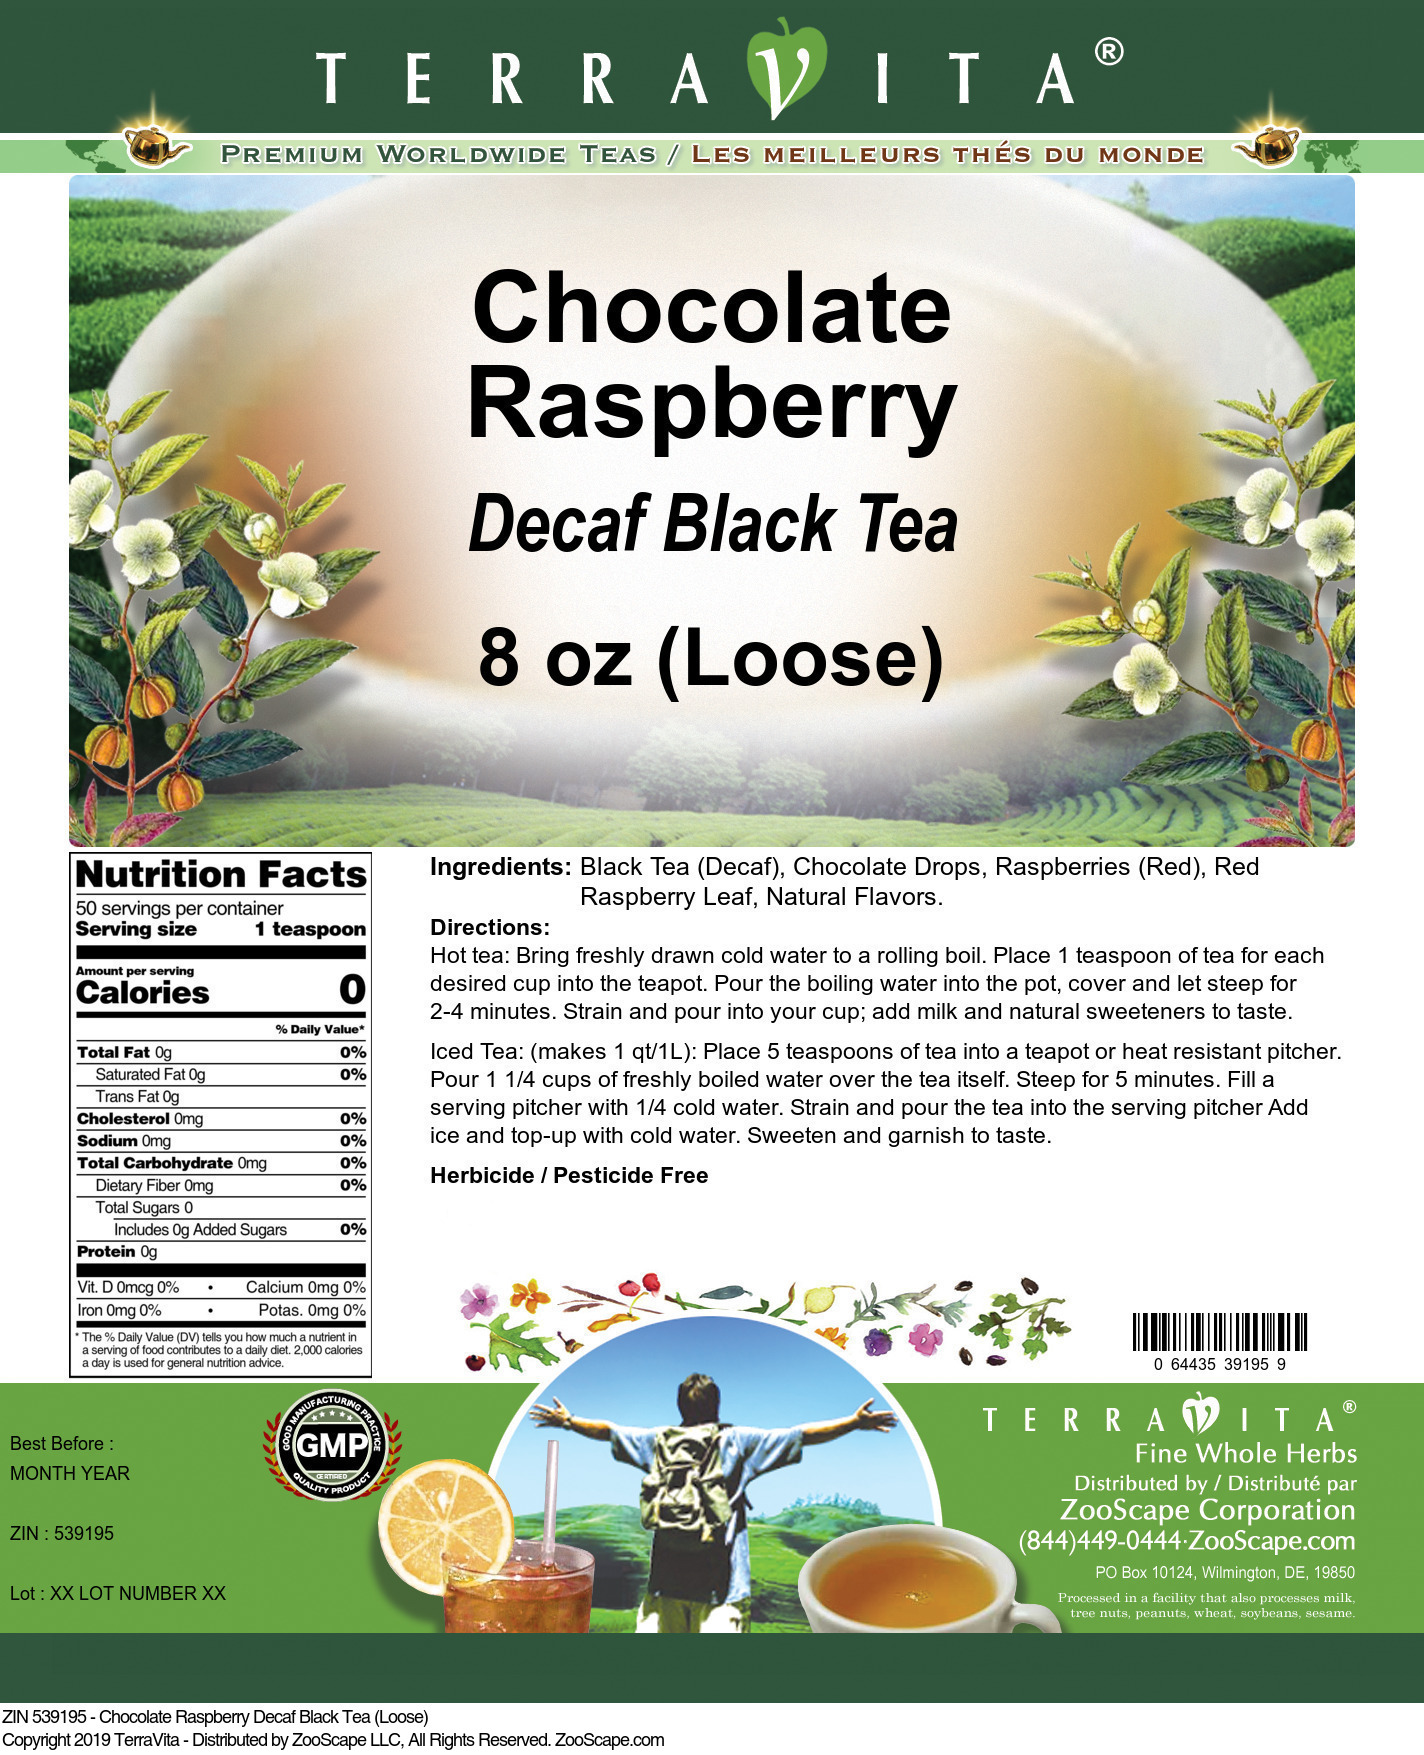 Chocolate Raspberry Decaf Black Tea (Loose)